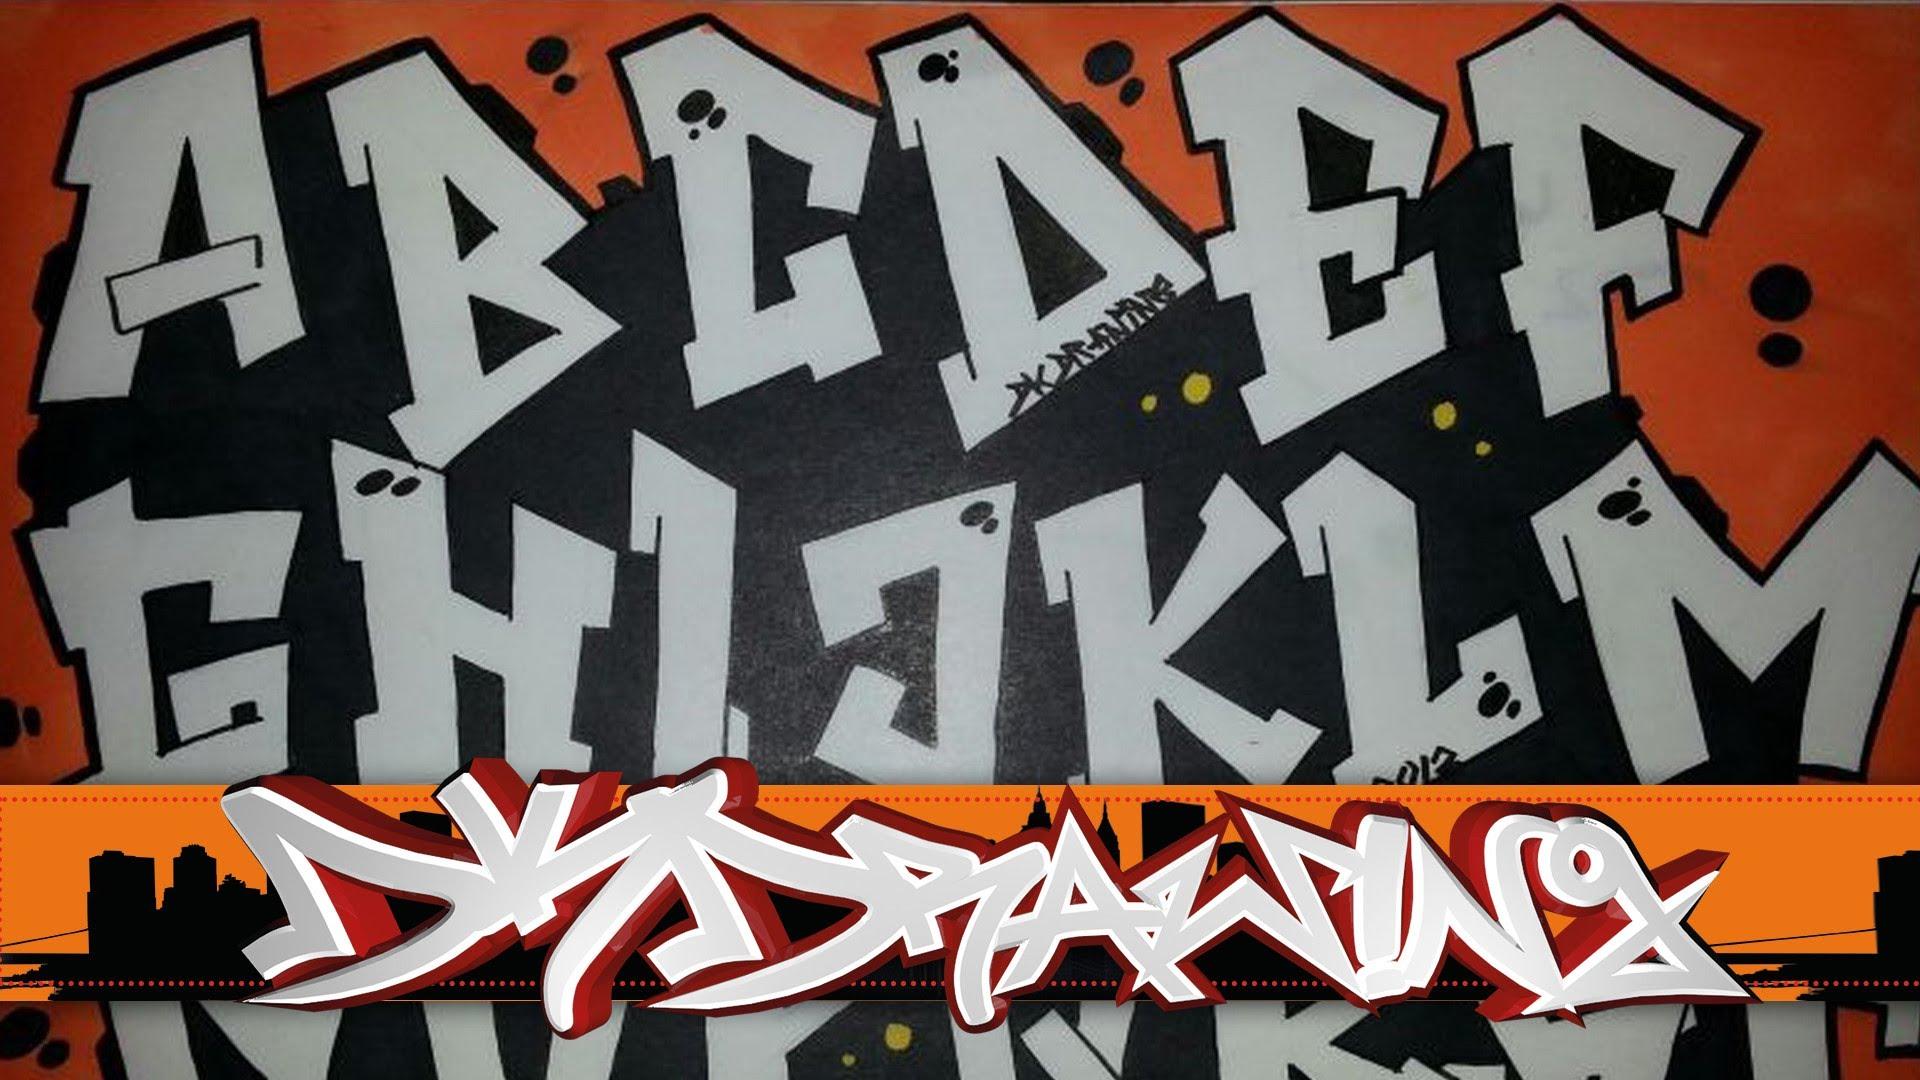 1920x1080 Graffiti Alphabet